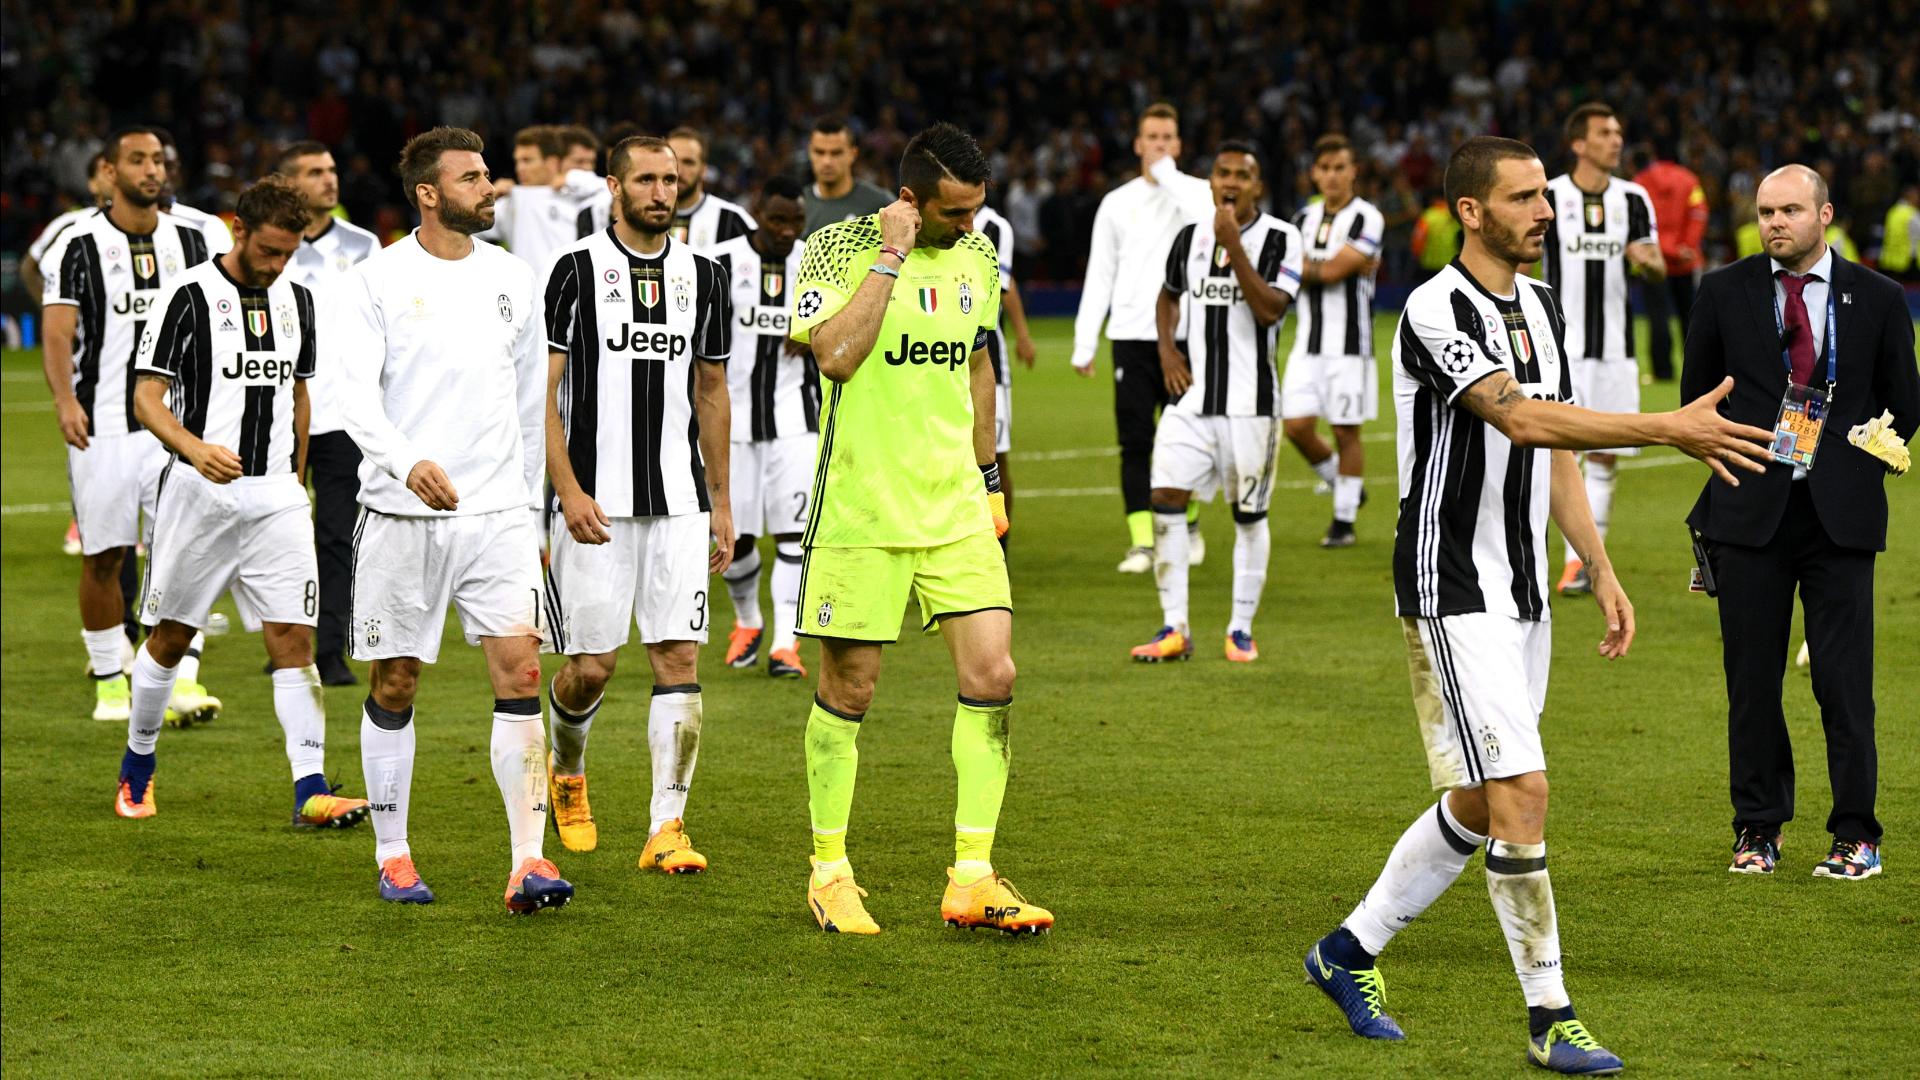 Champions League, Real Madrid campione d'Europa 2017: l'esultanza al Bernabeu